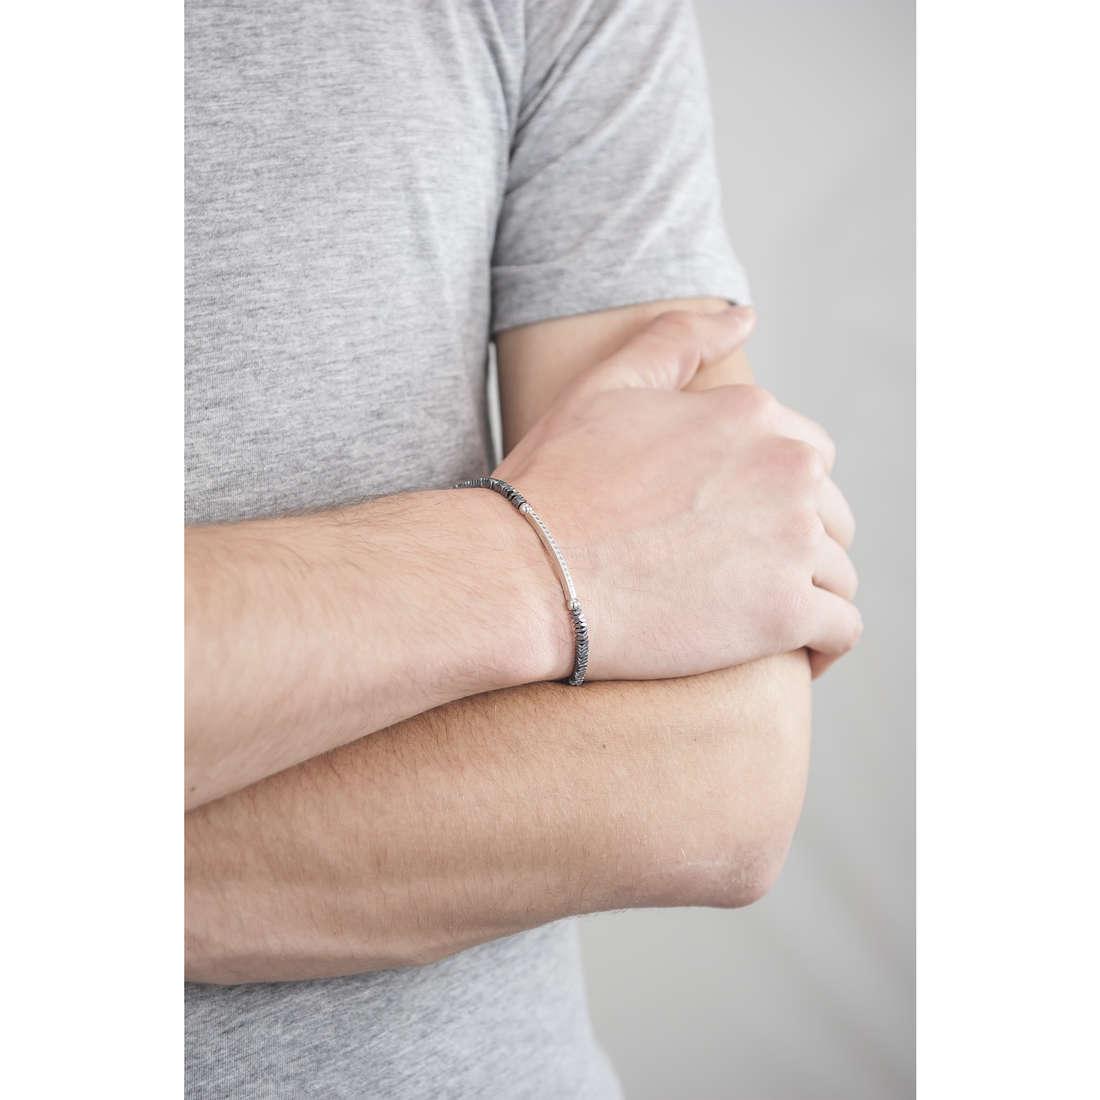 Morellato bracciali Ematite uomo SAHT03 indosso